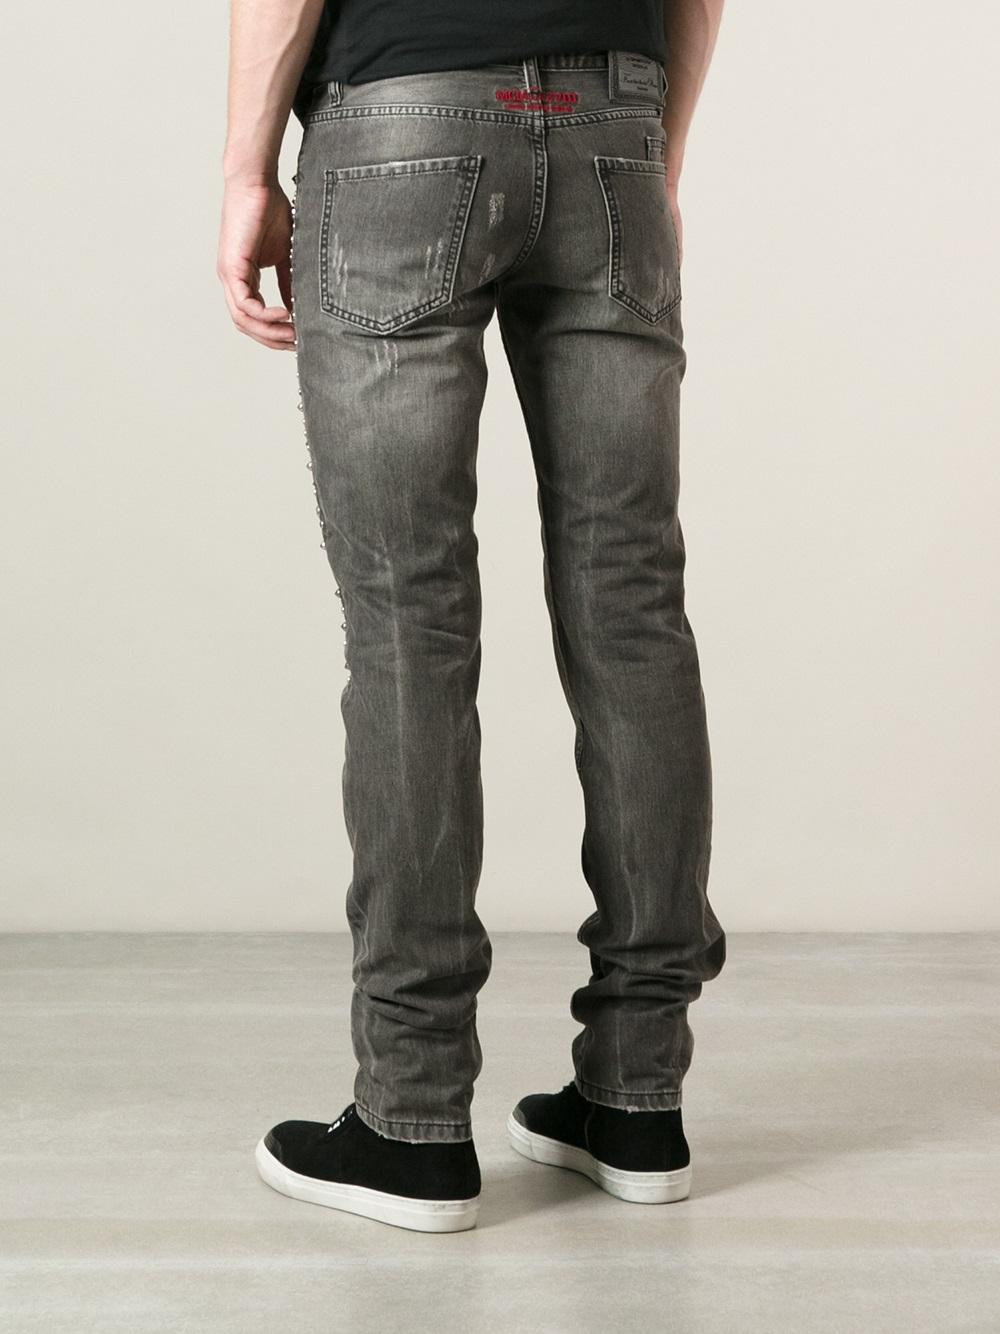 lyst philipp plein embellished jeans in gray for men. Black Bedroom Furniture Sets. Home Design Ideas